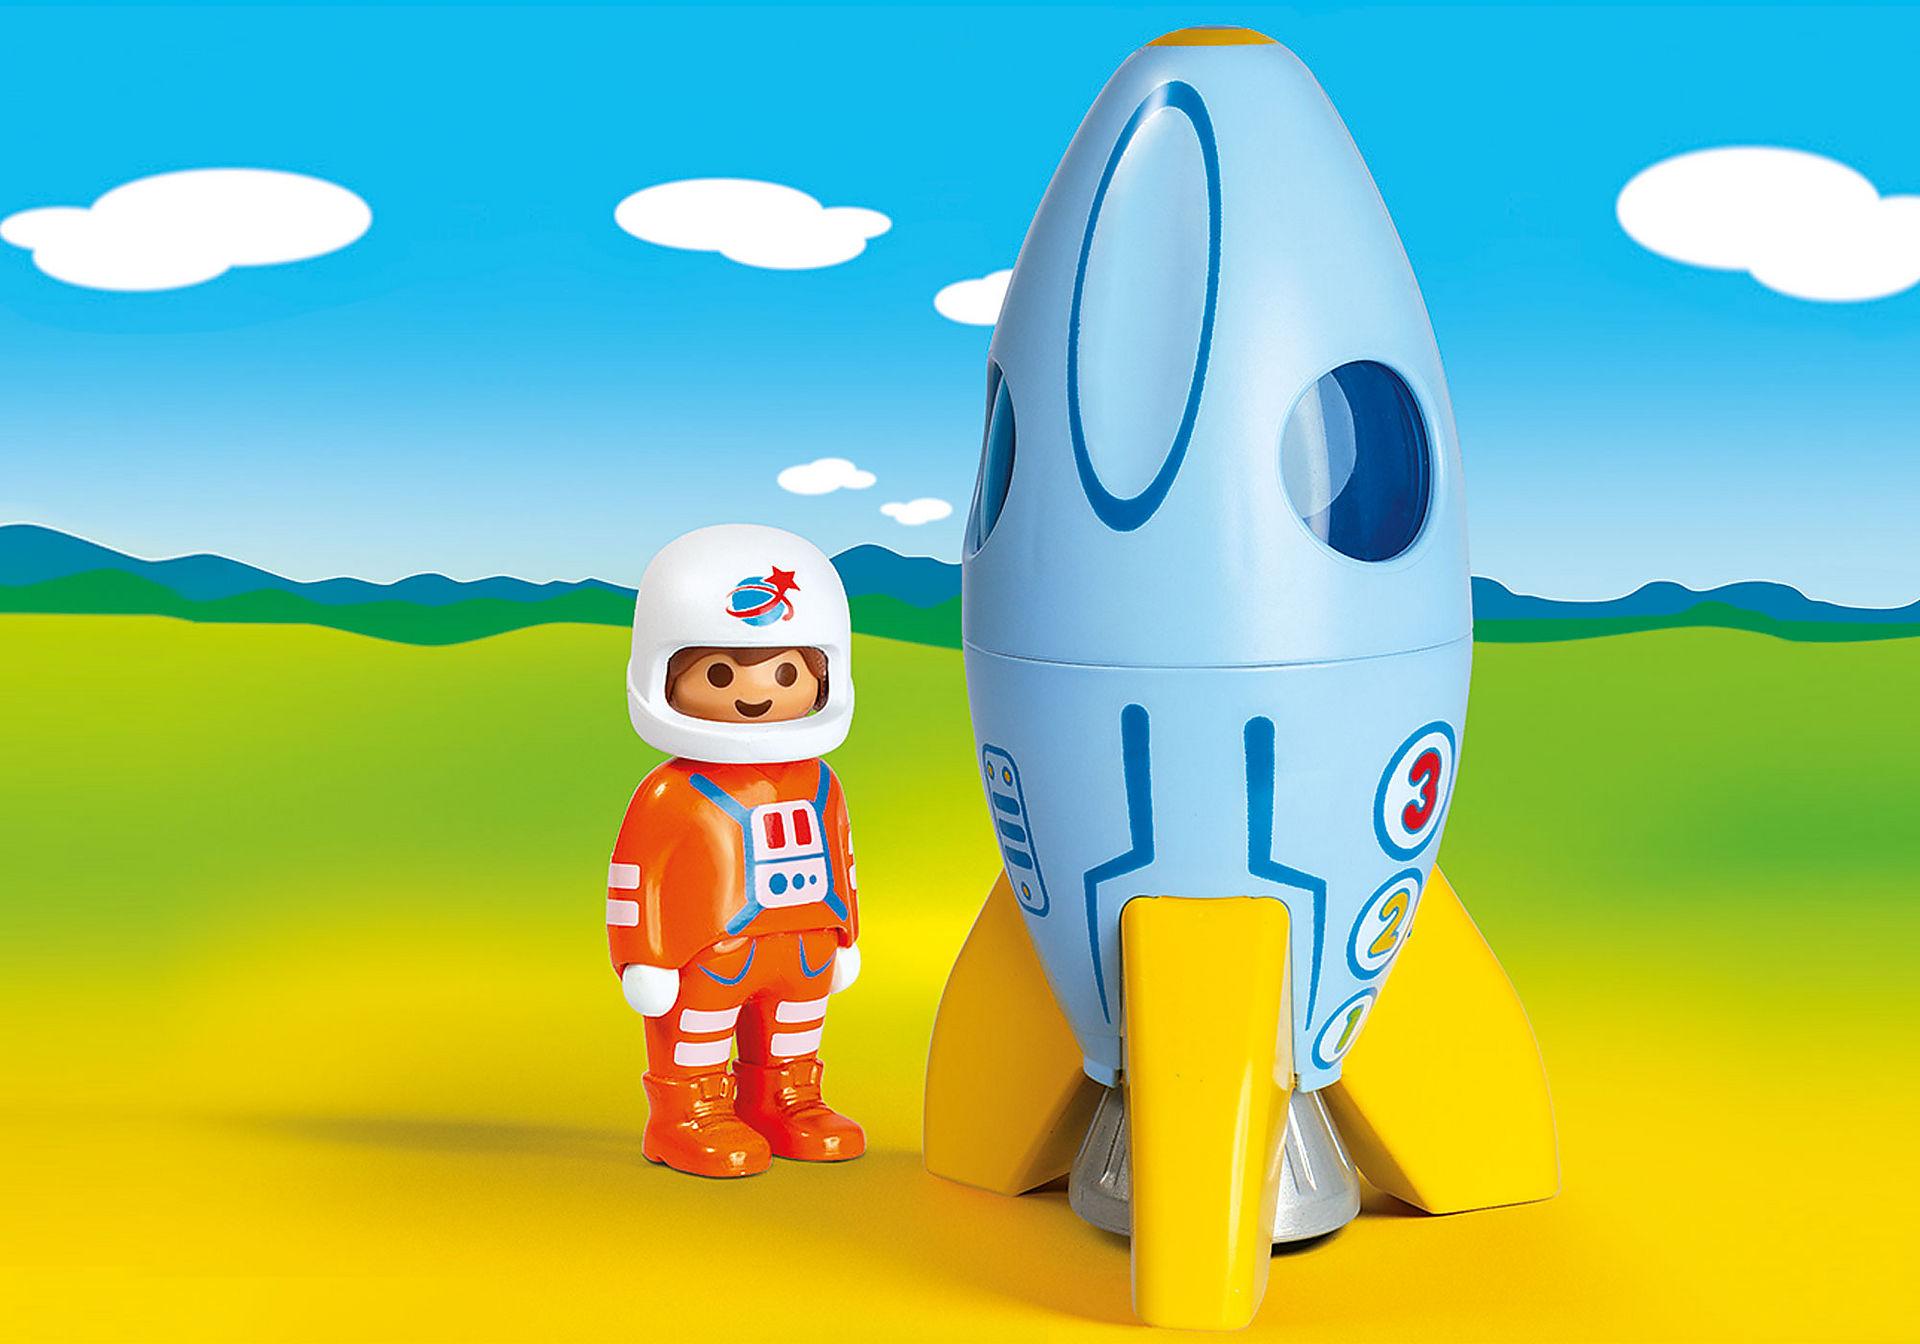 70186 Razzo con astronauta 1.2.3 zoom image1